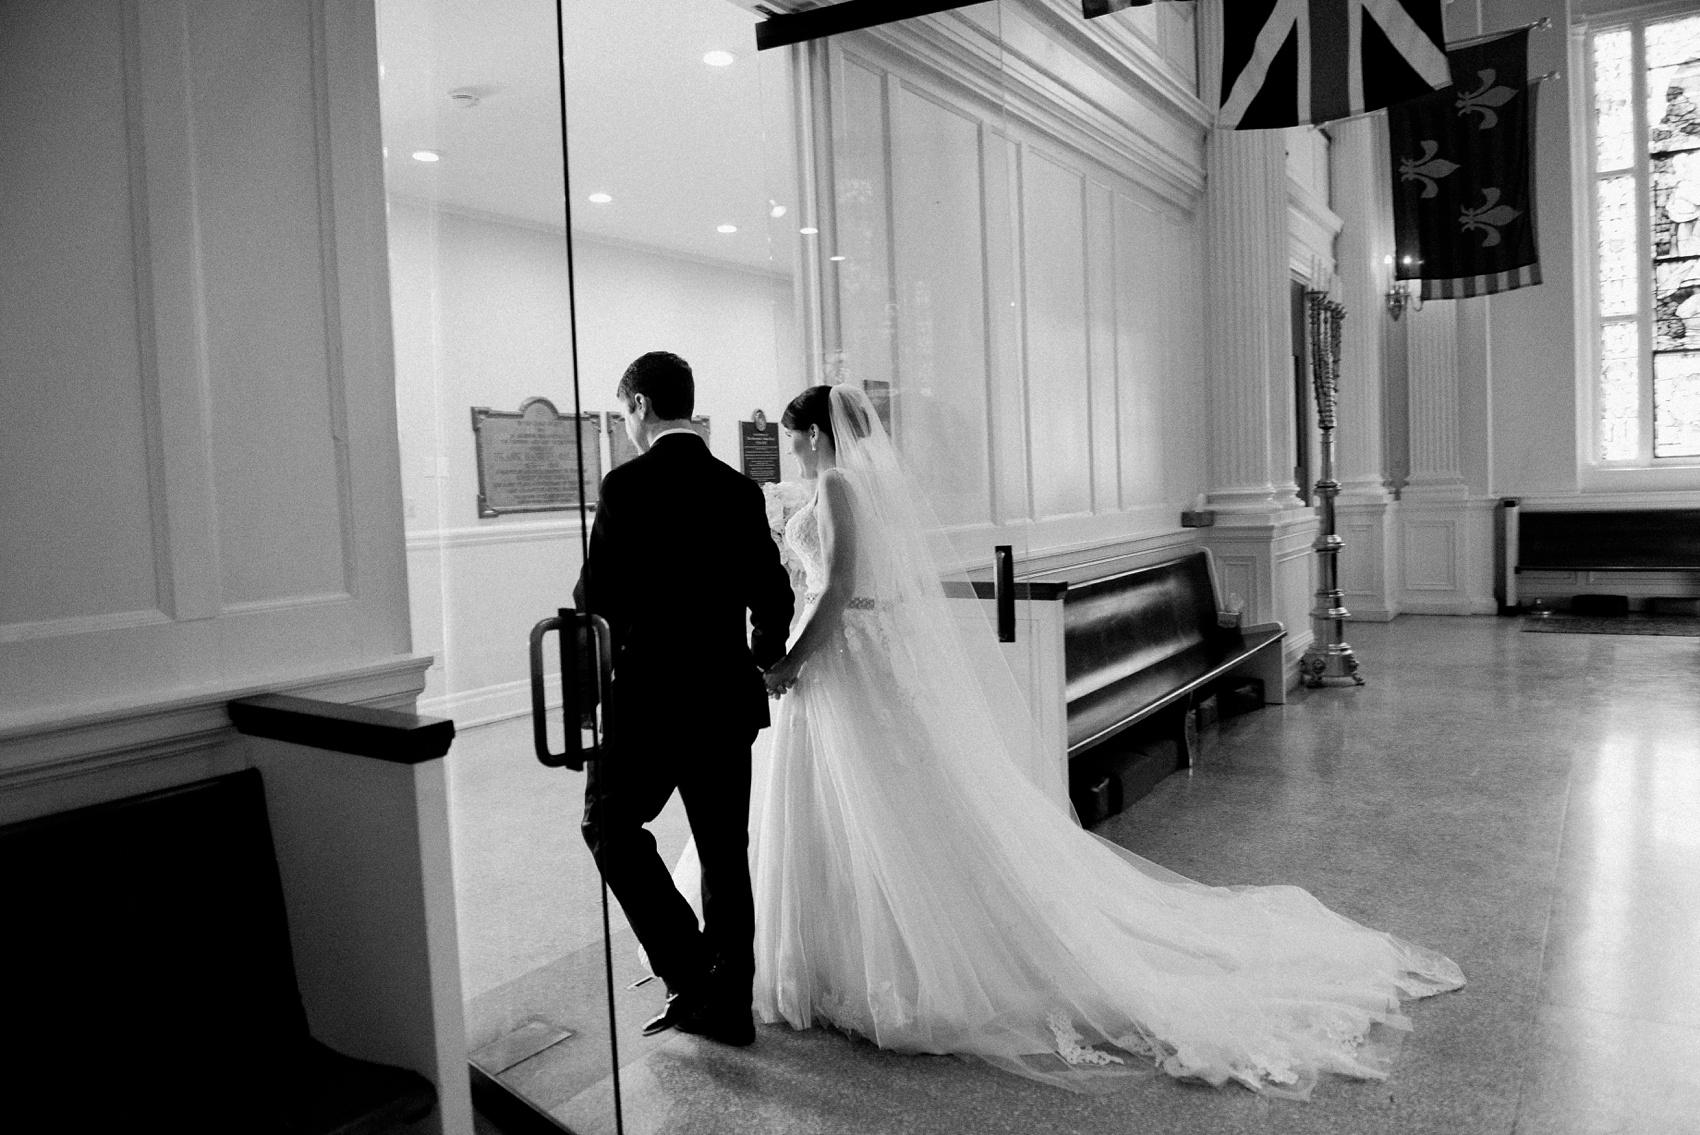 augusta_wedding_photographer_0041.jpg